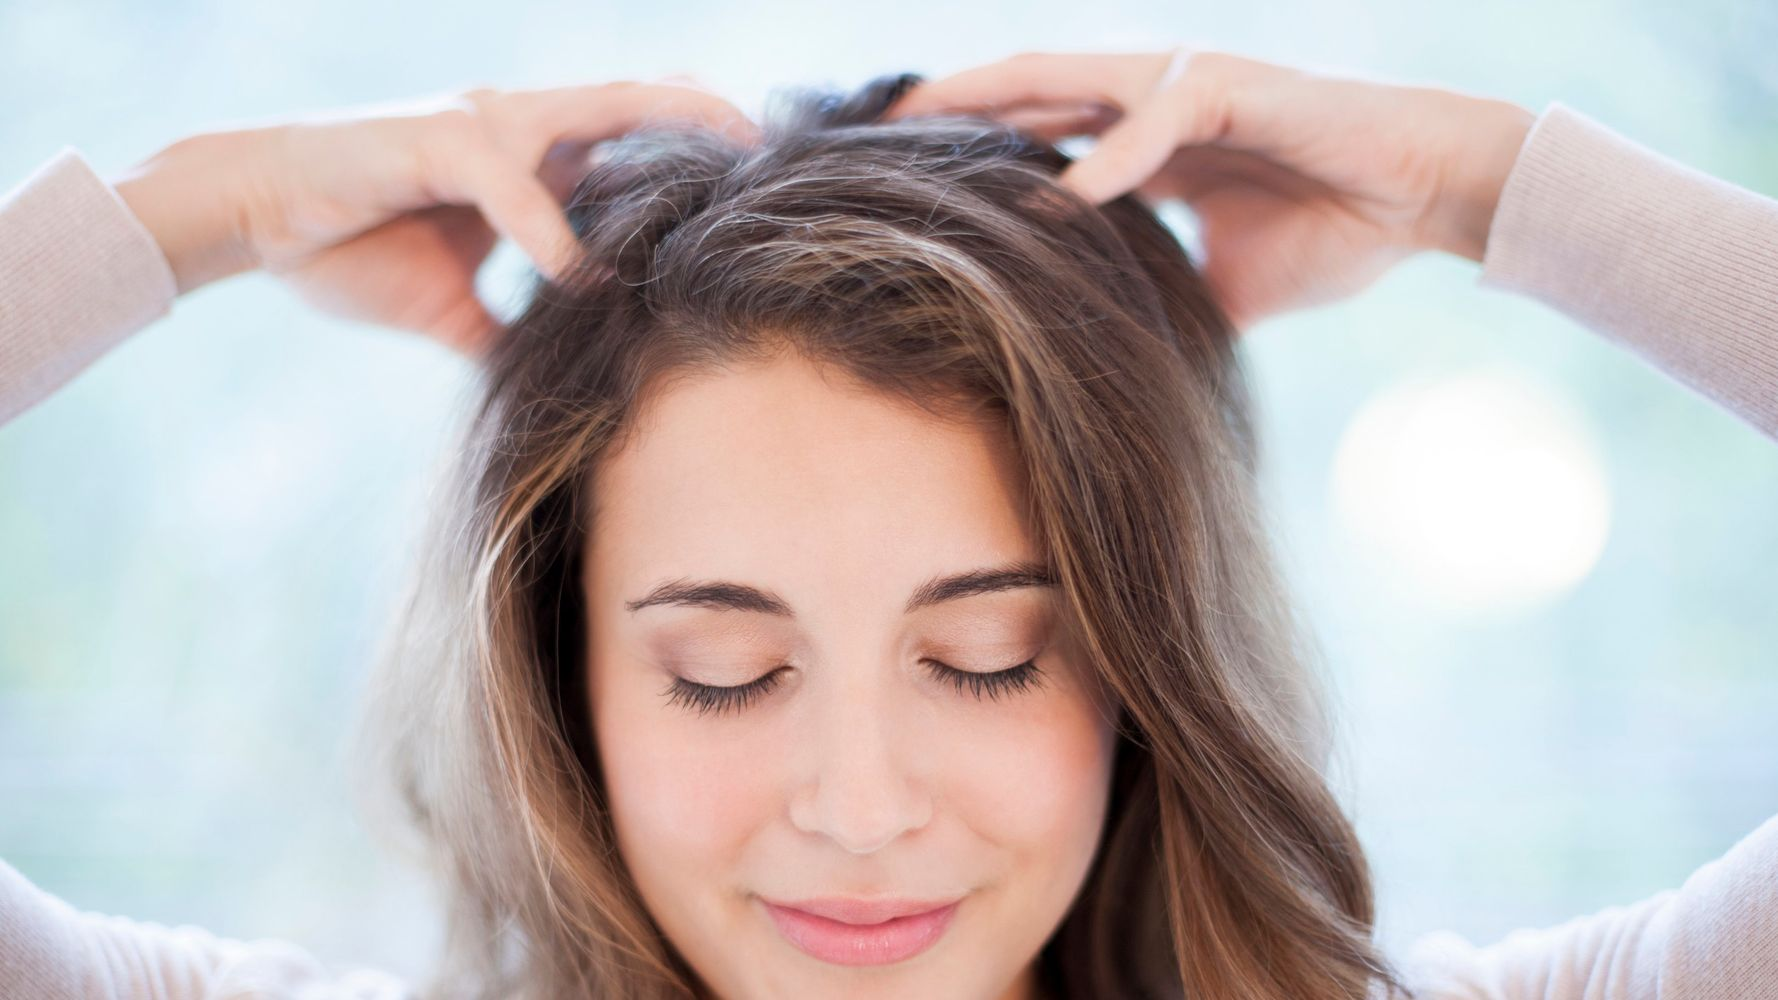 فوائد سكراب فروة الرأس